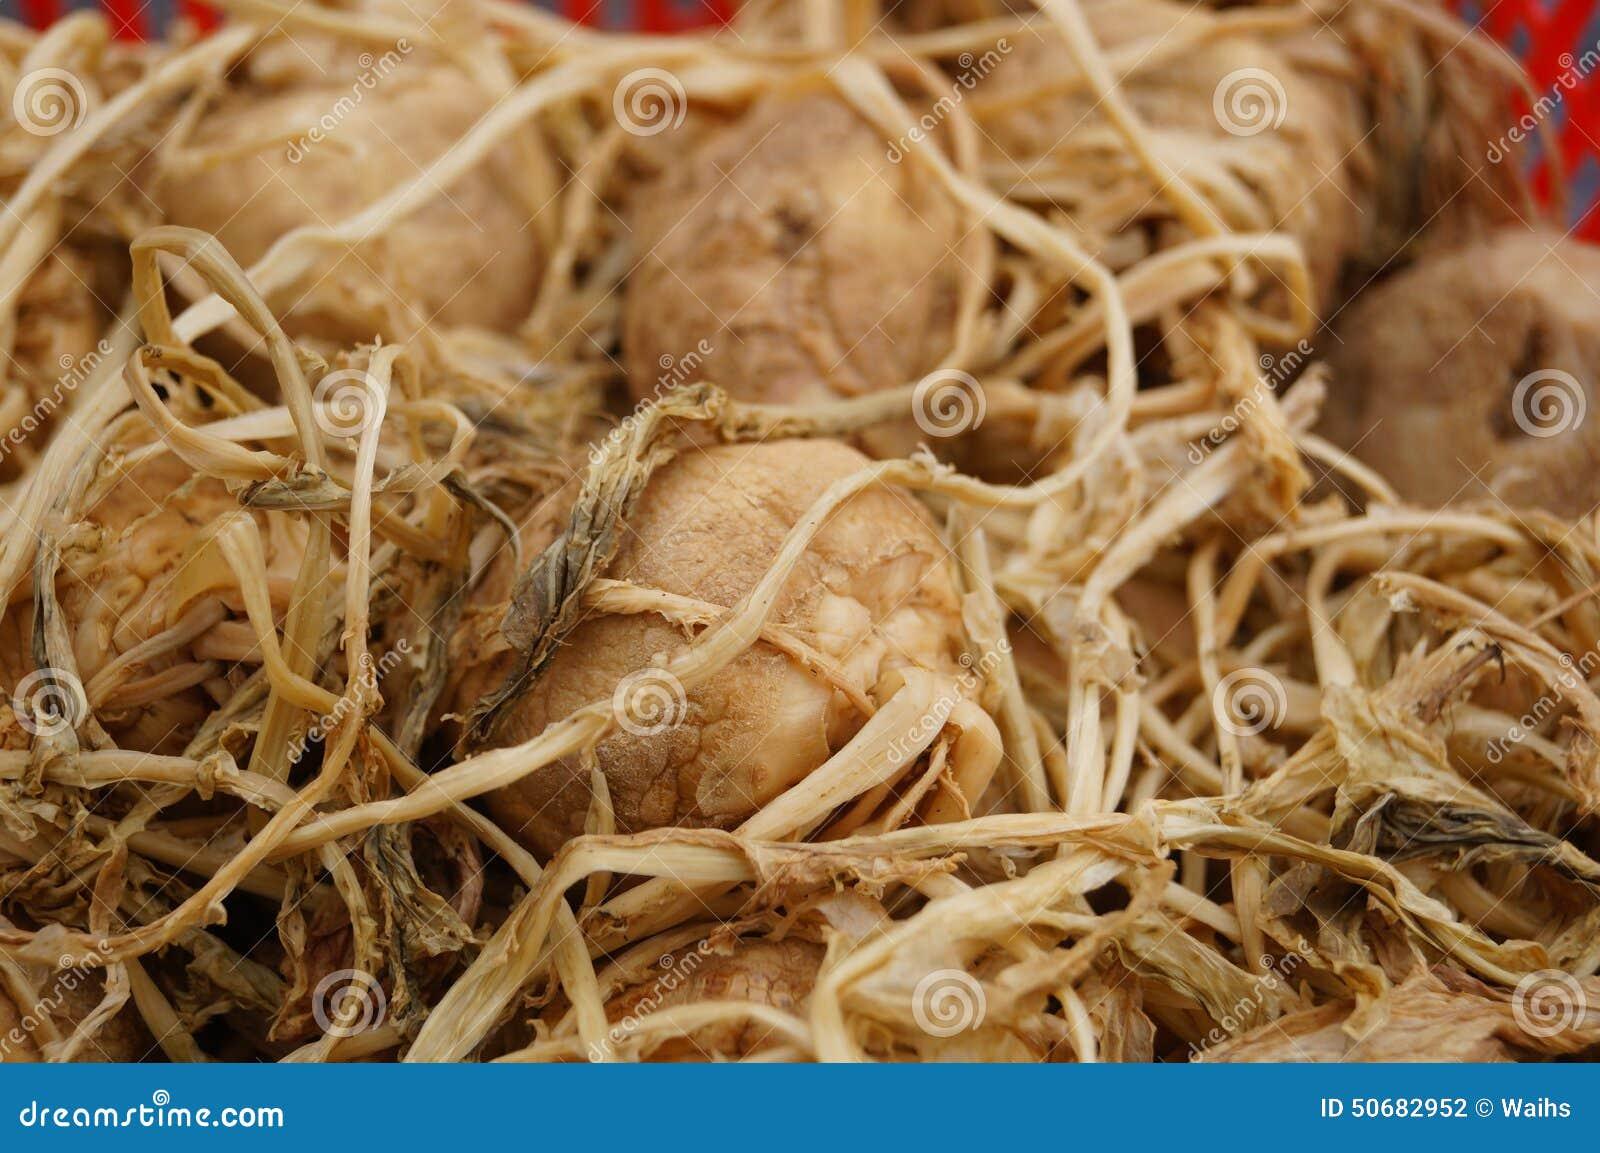 Download 菜干头 库存照片. 图片 包括有 市场, 功能, 农夫, 背包, 烘干, 仍然, 食物, 生活, 蔬菜, 对象 - 50682952